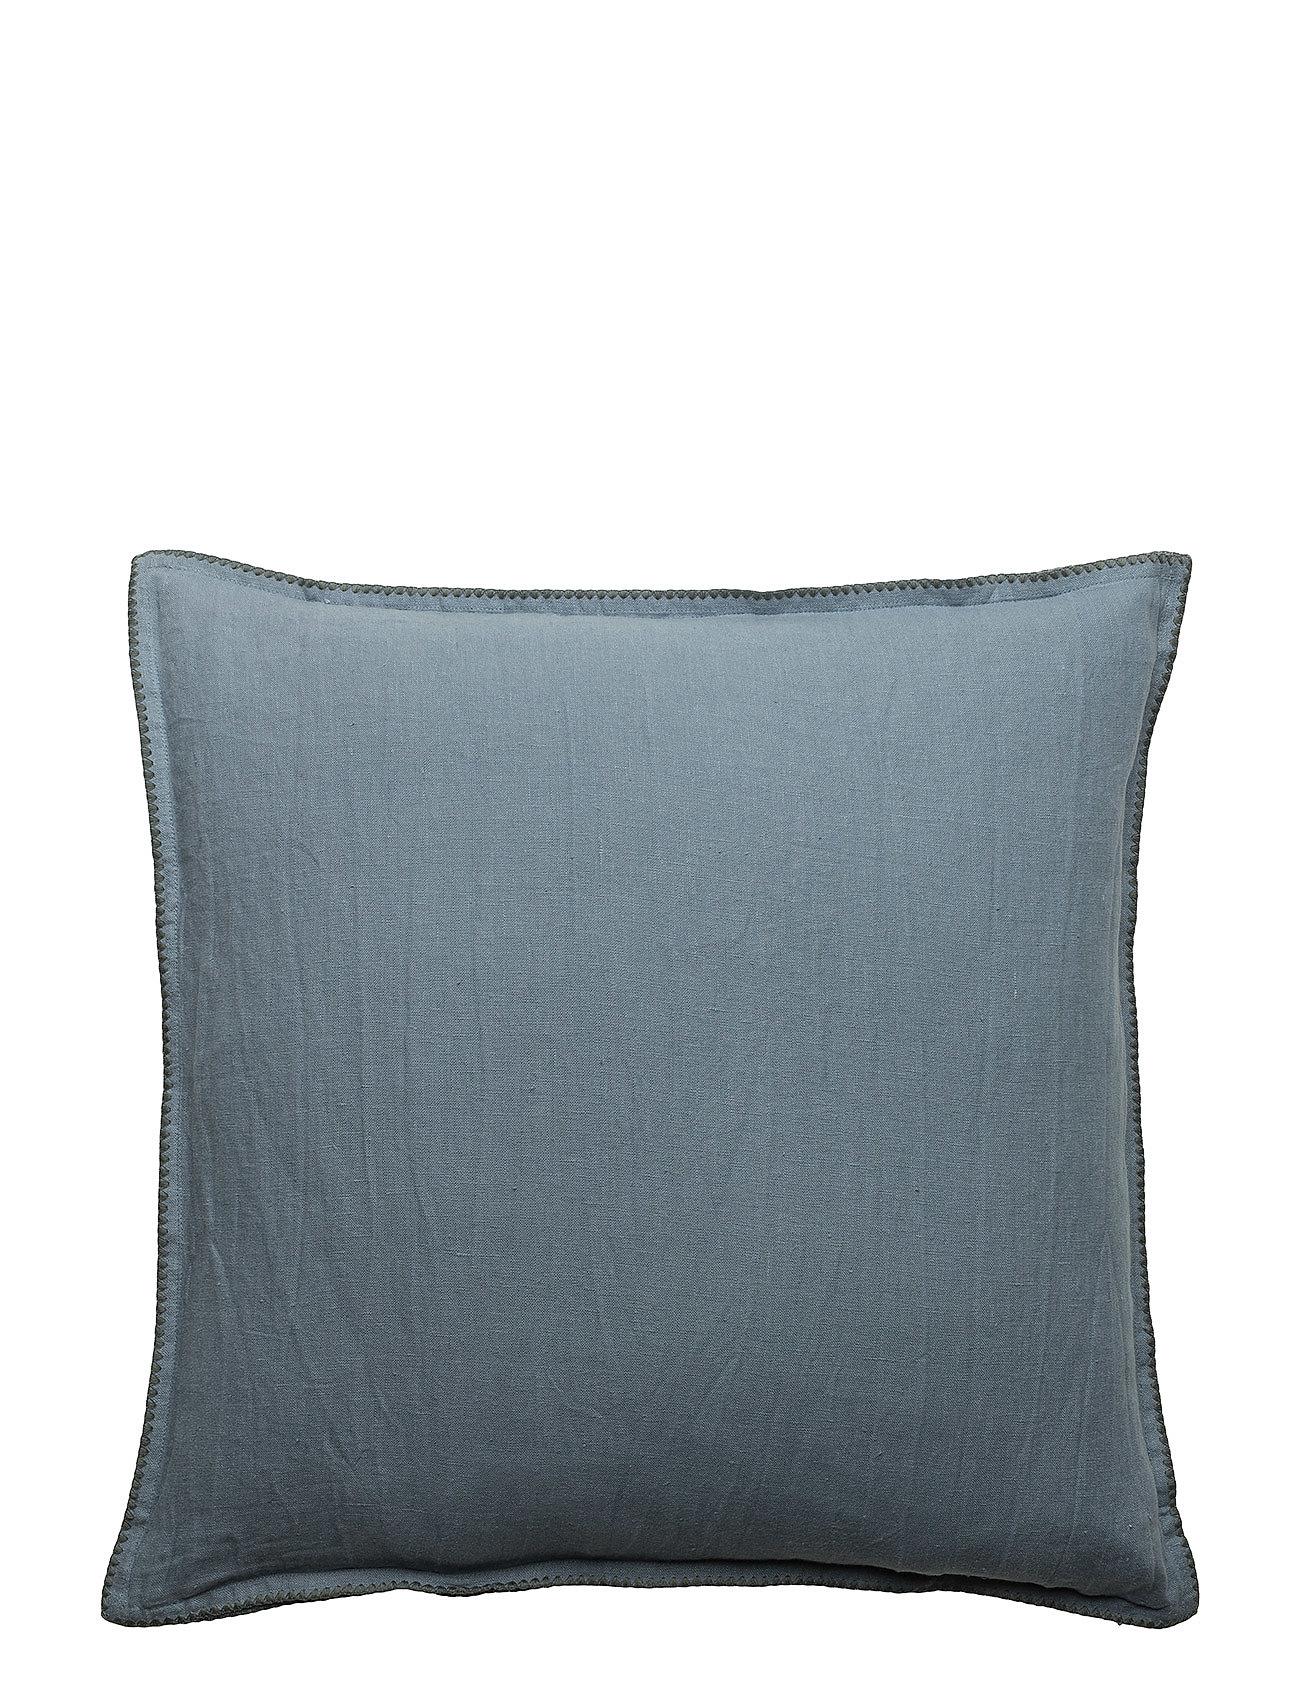 DAY Home Lino Cushion Cover - WINTER LAKE